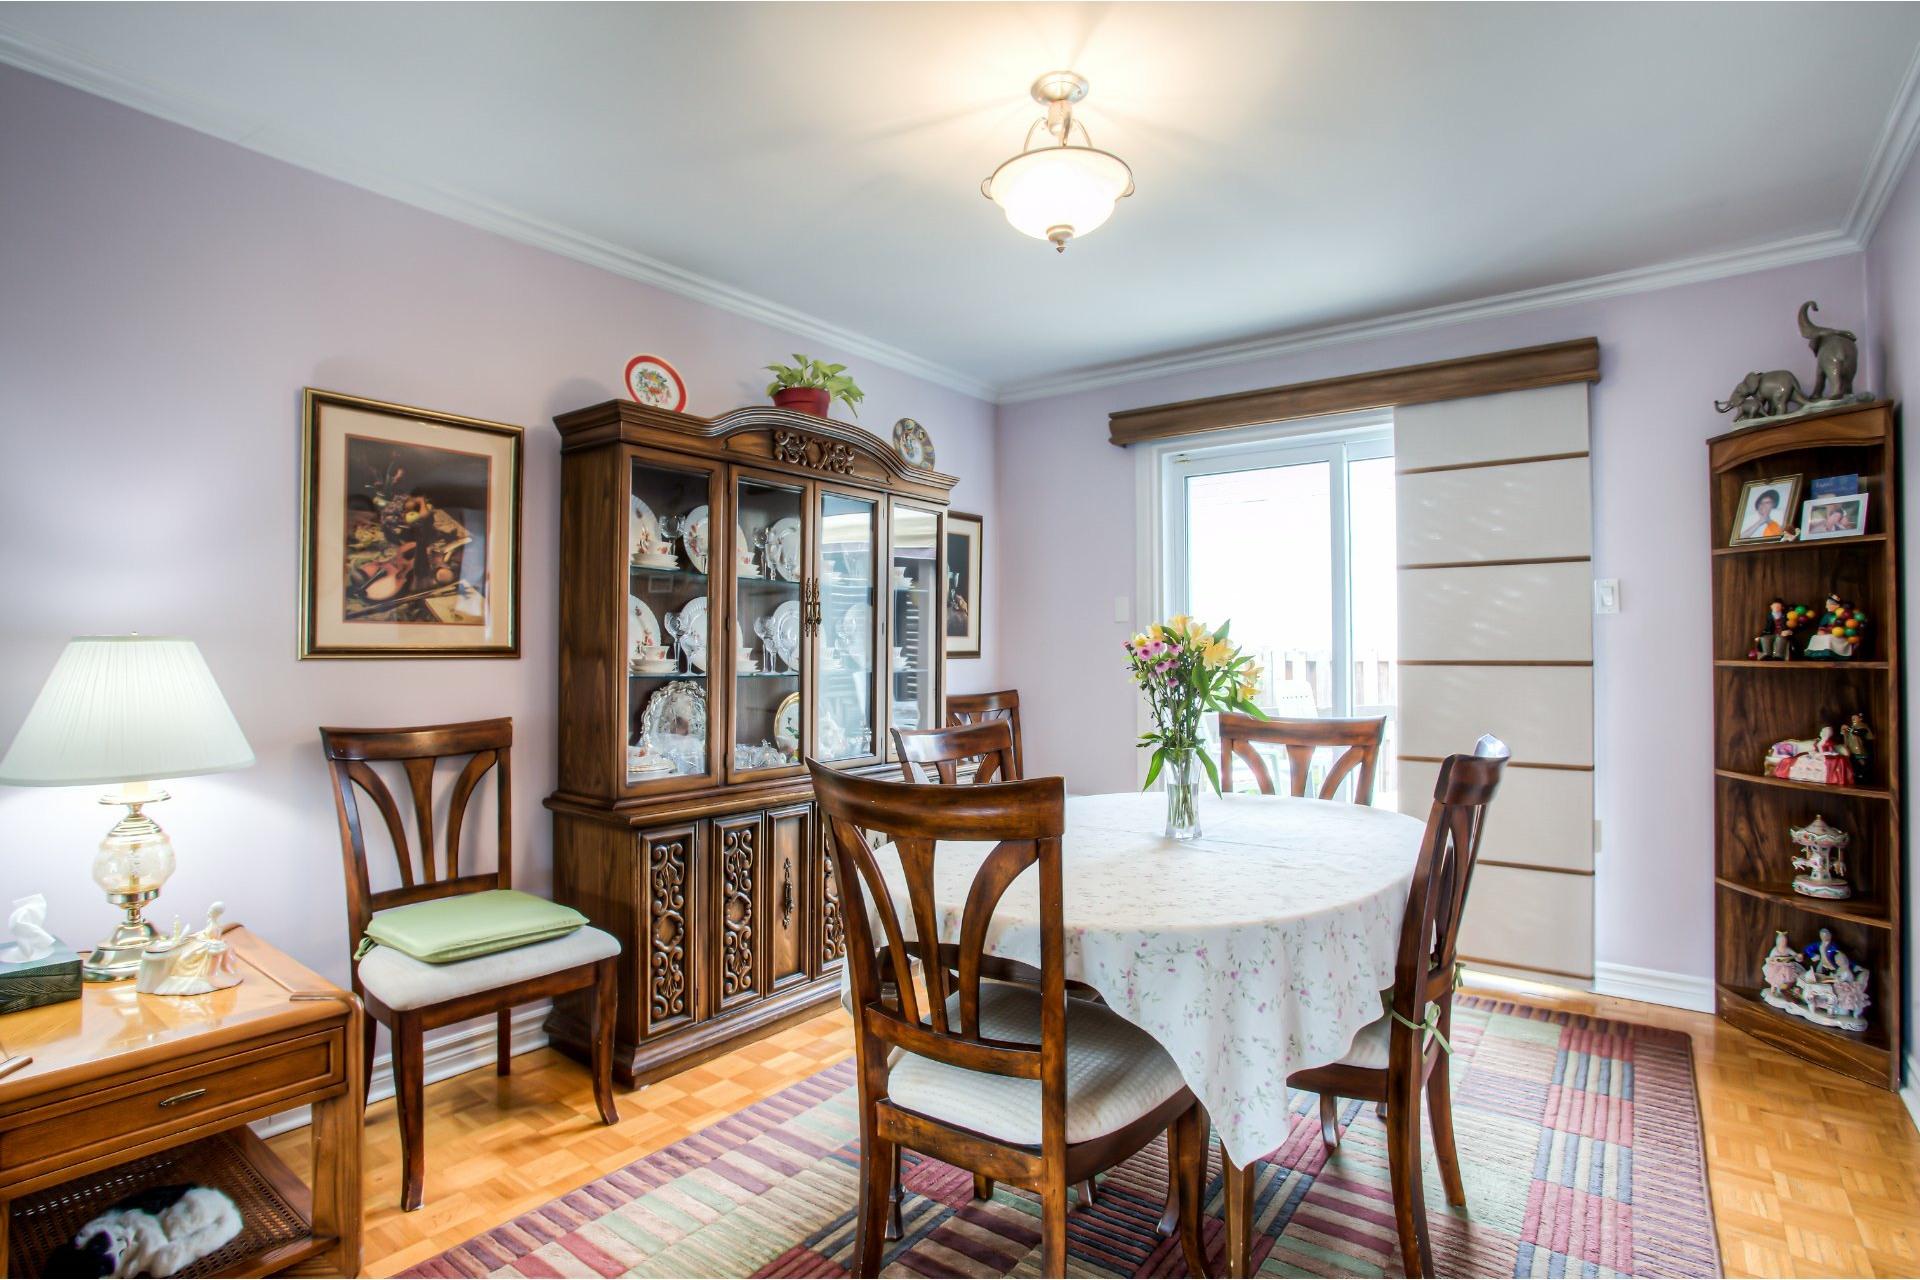 image 6 - House For sale Pierrefonds-Roxboro Montréal  - 10 rooms